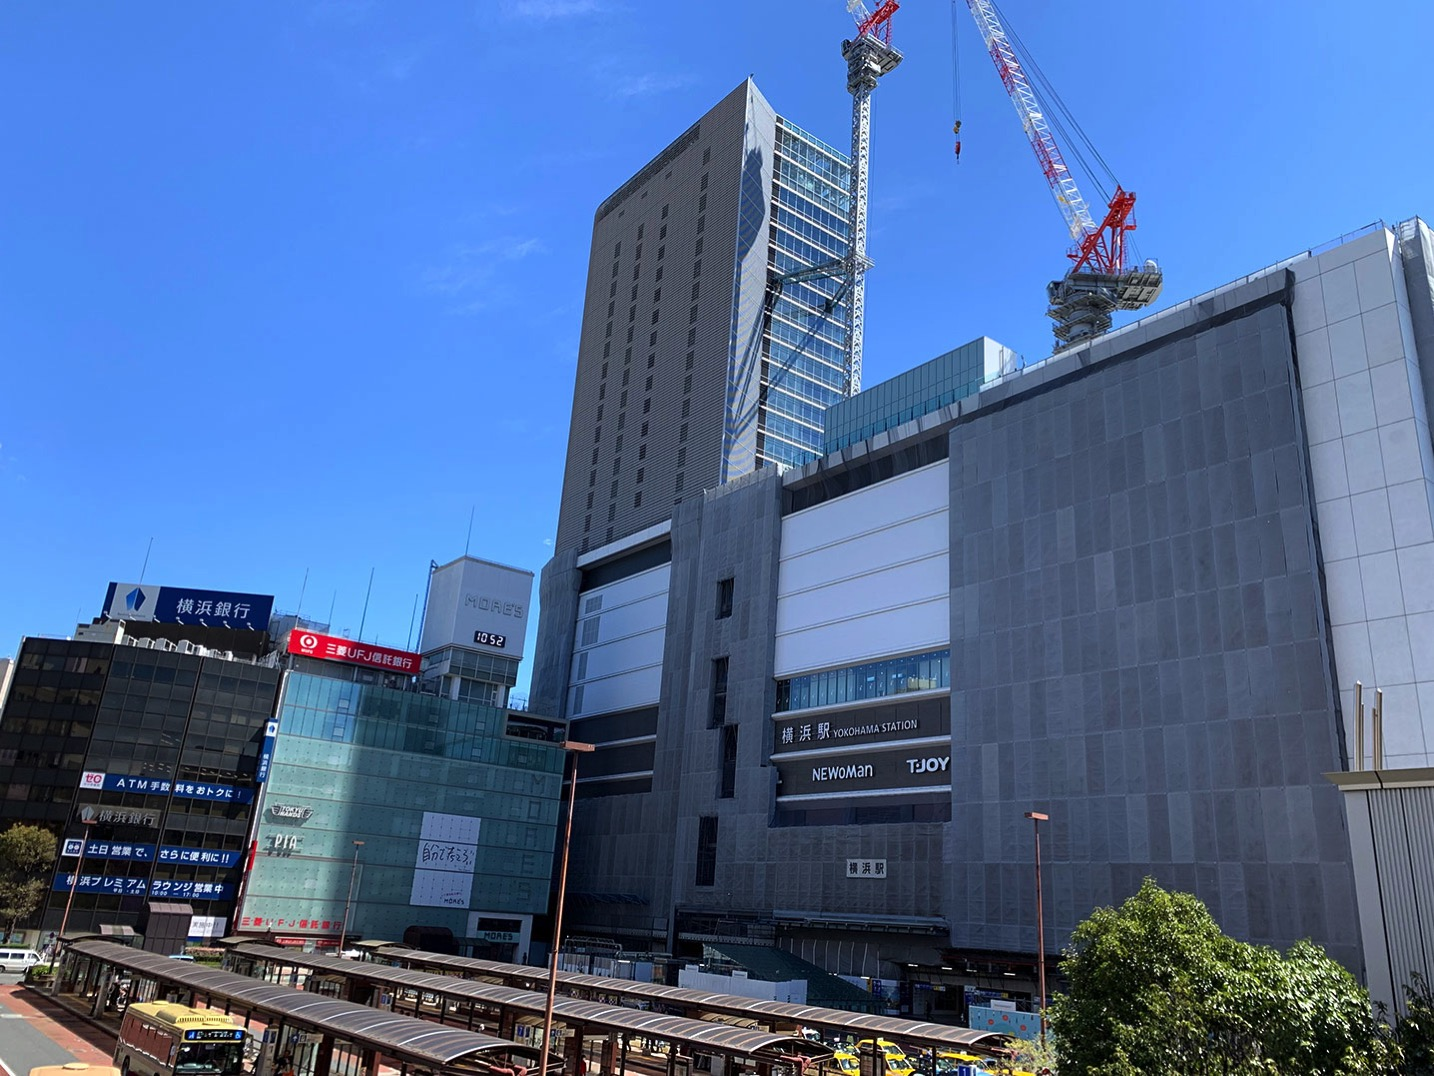 2019年4月 横浜駅西口の様子